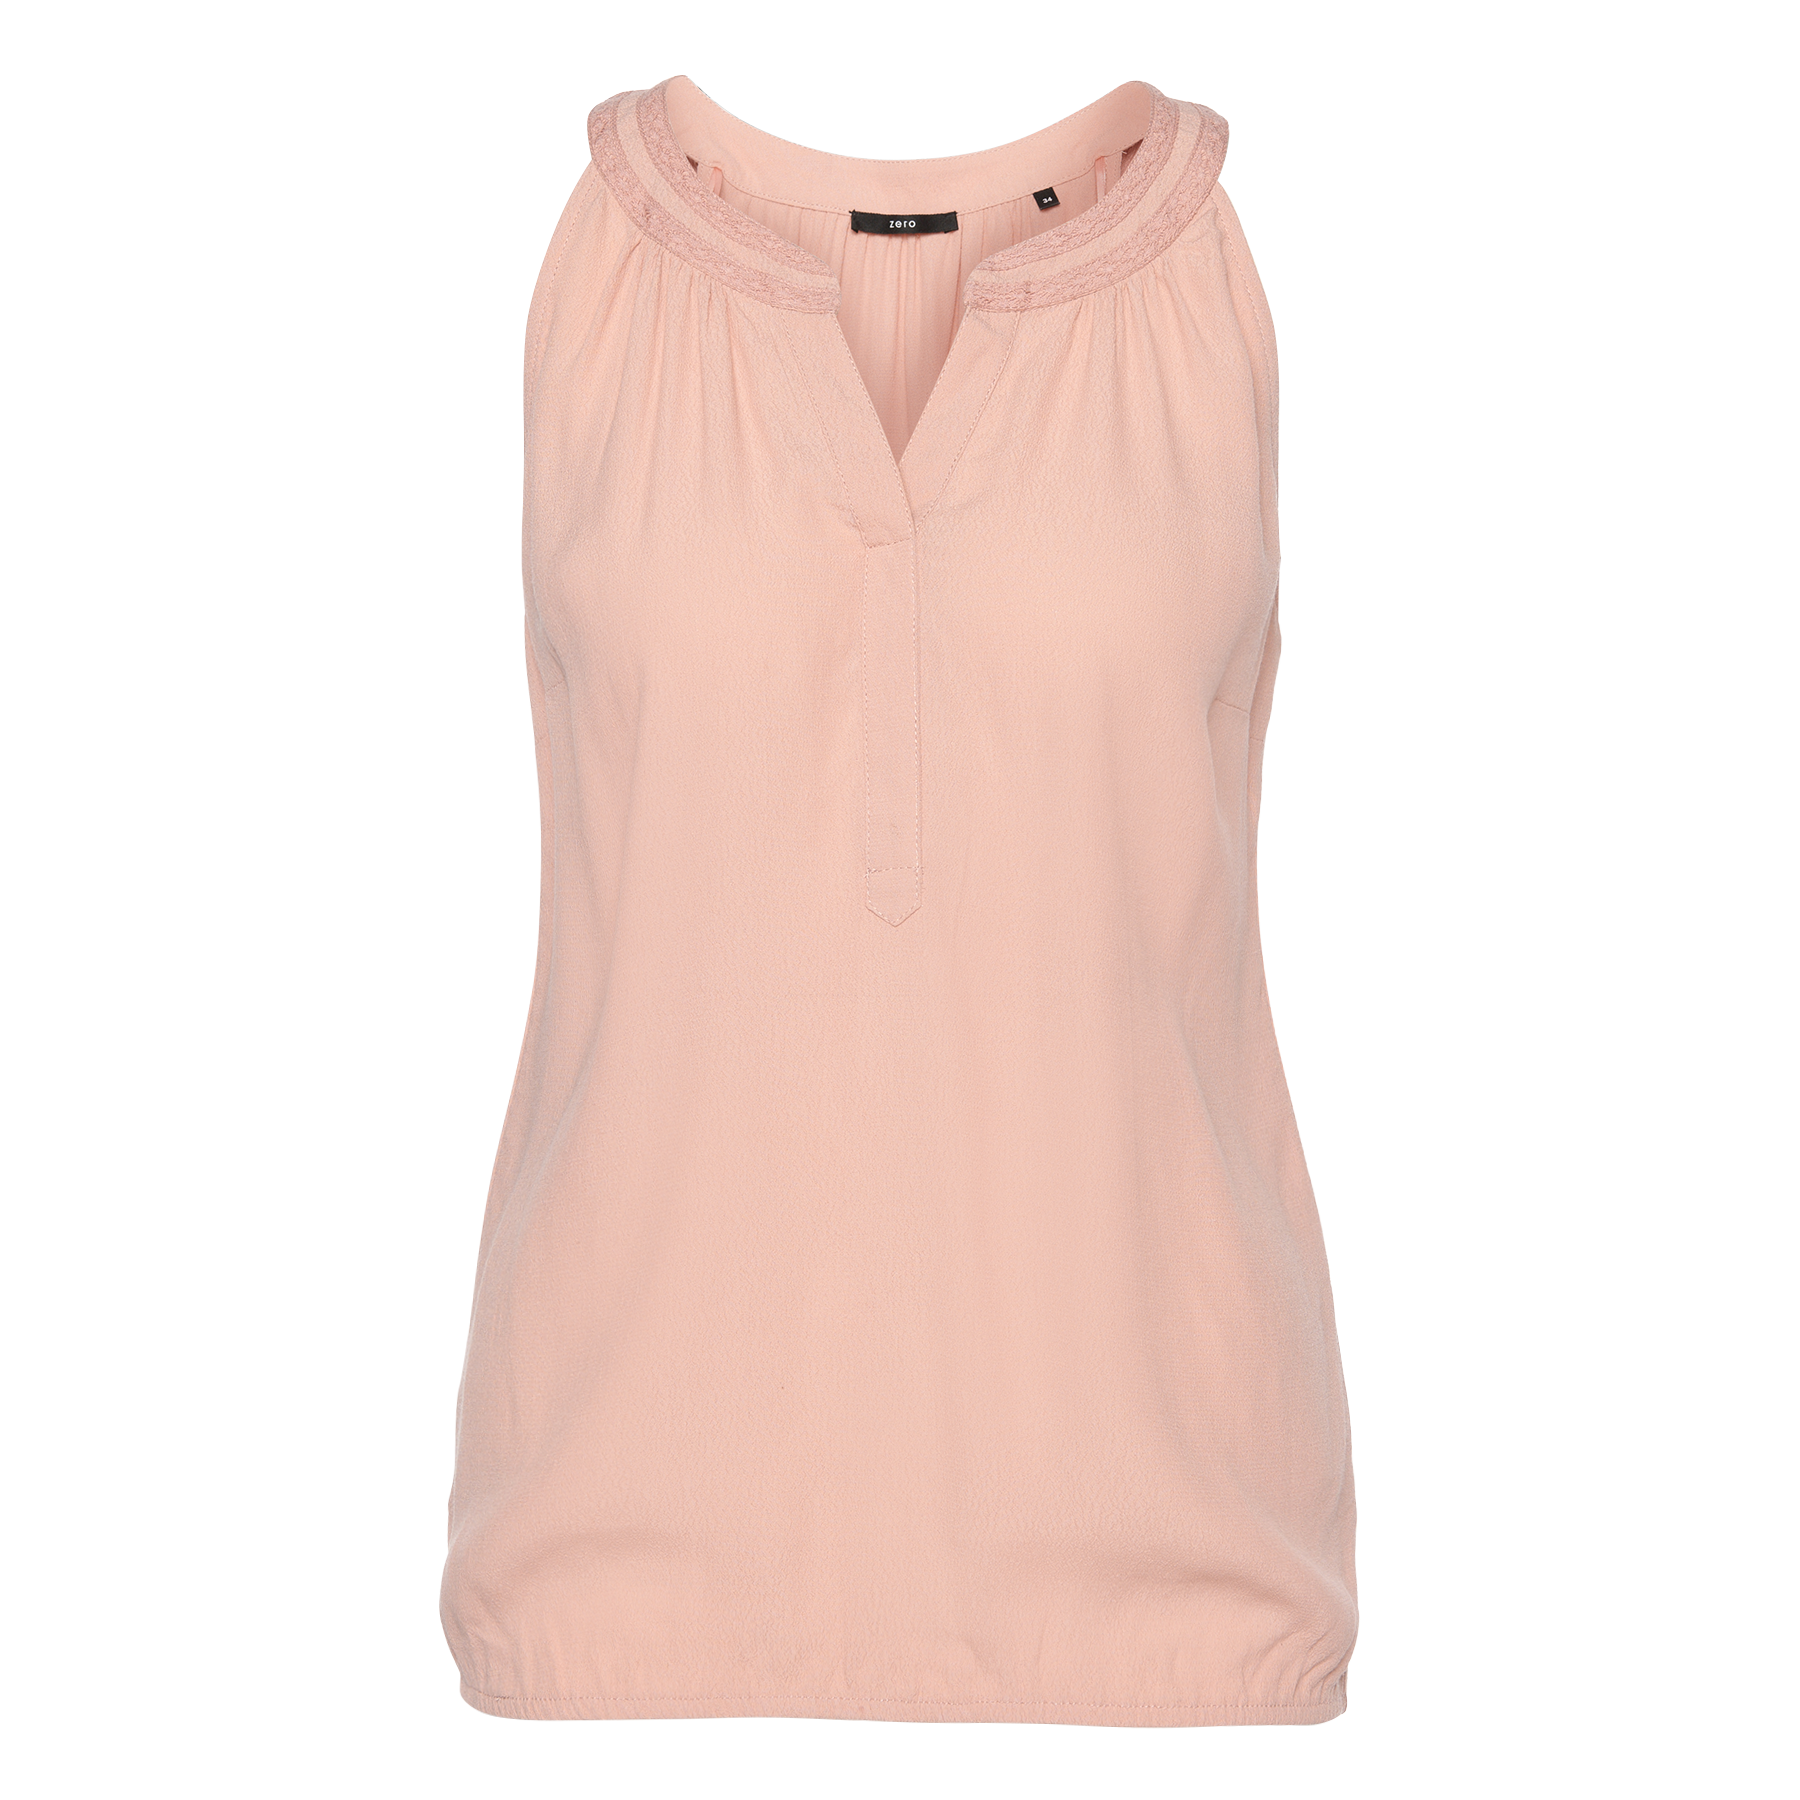 Bluse aus Crêpe-Viskose rose parfait